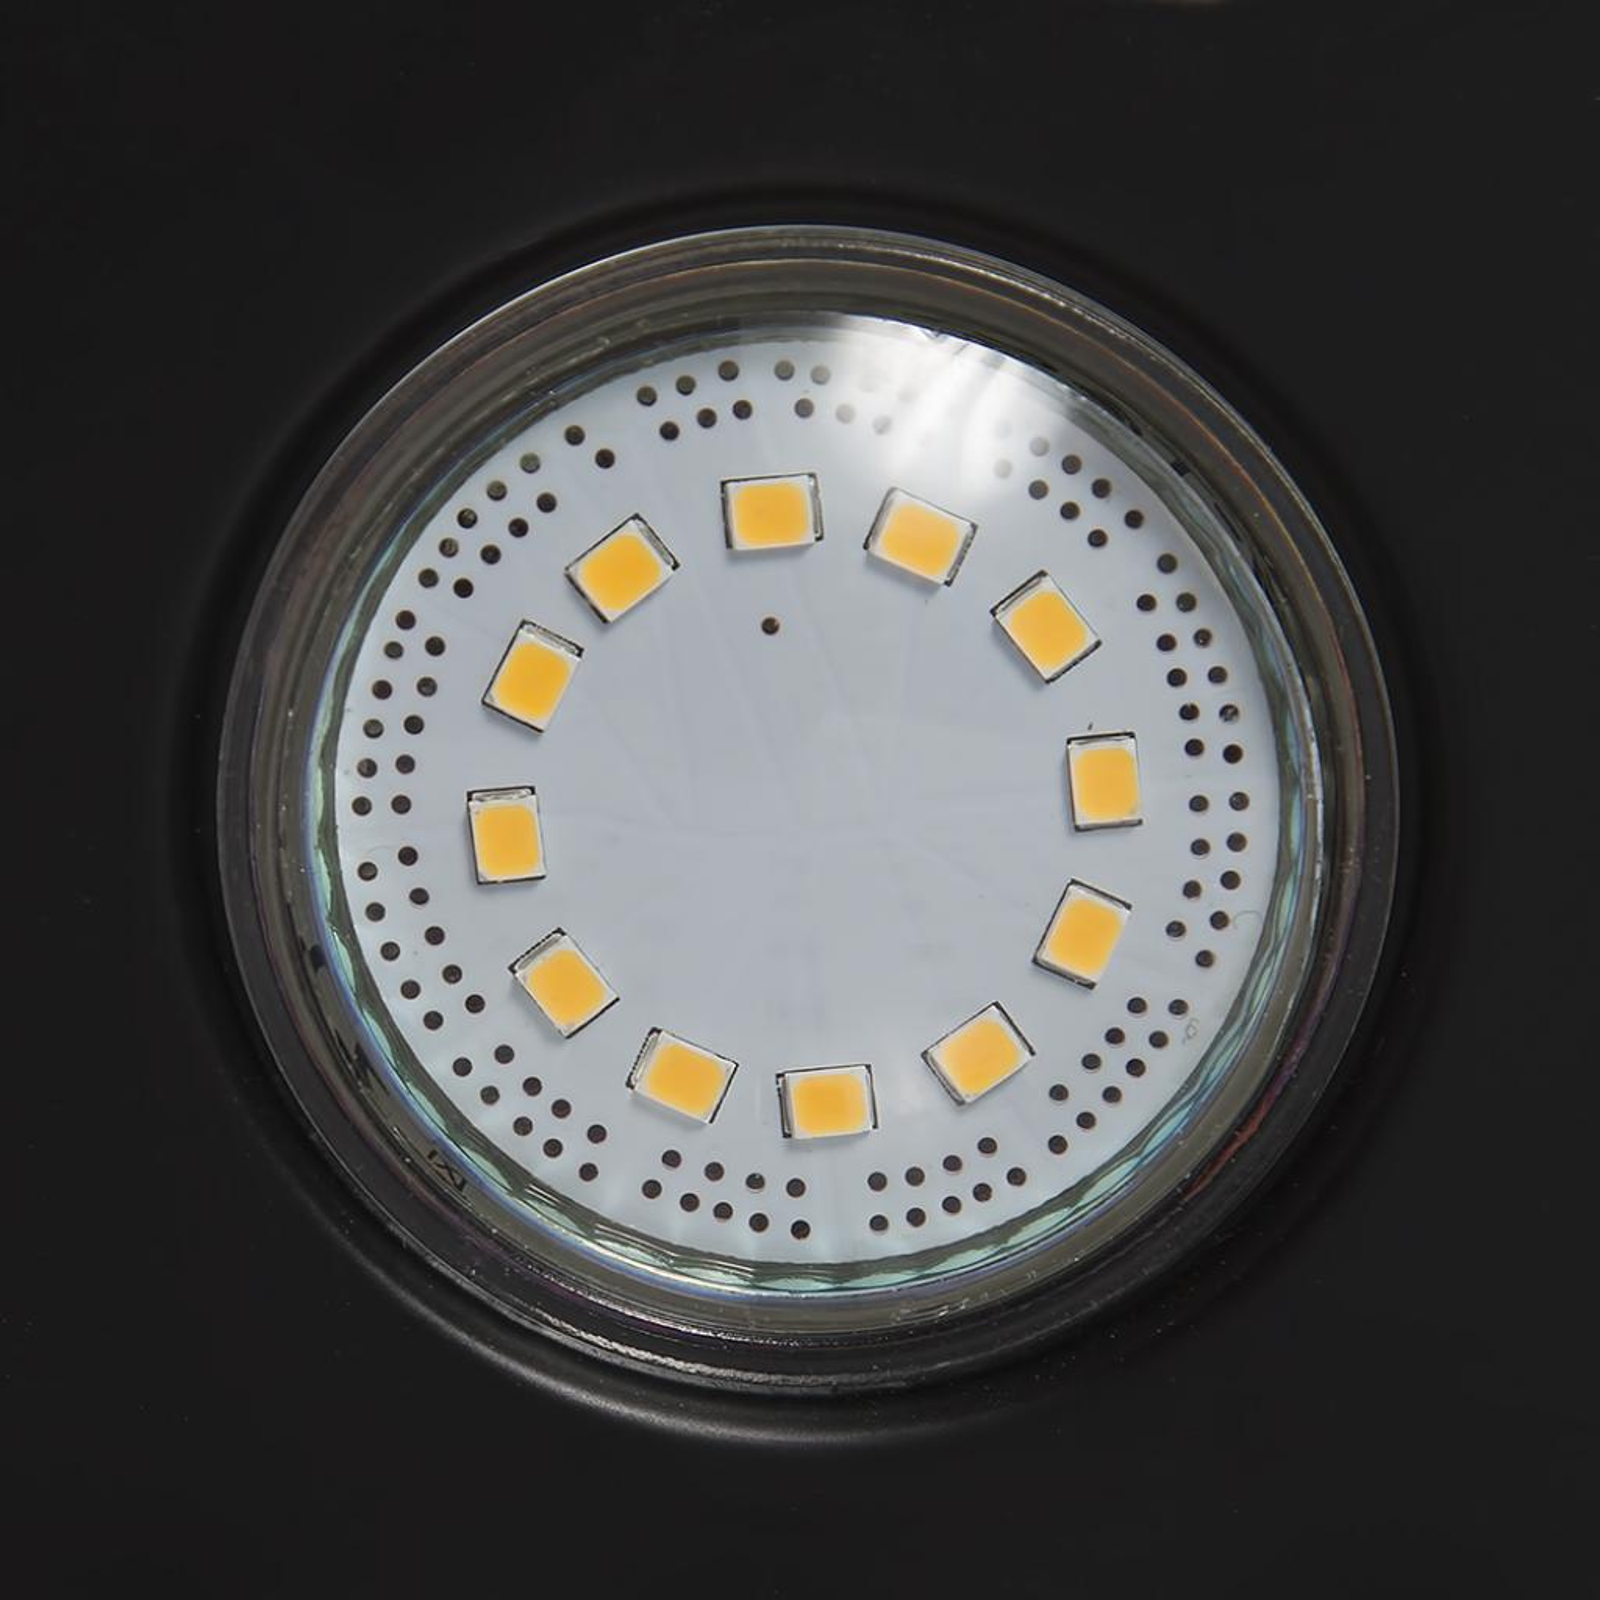 Вытяжка кухонная PERFELLI K 614 Black Country LED изображение 6